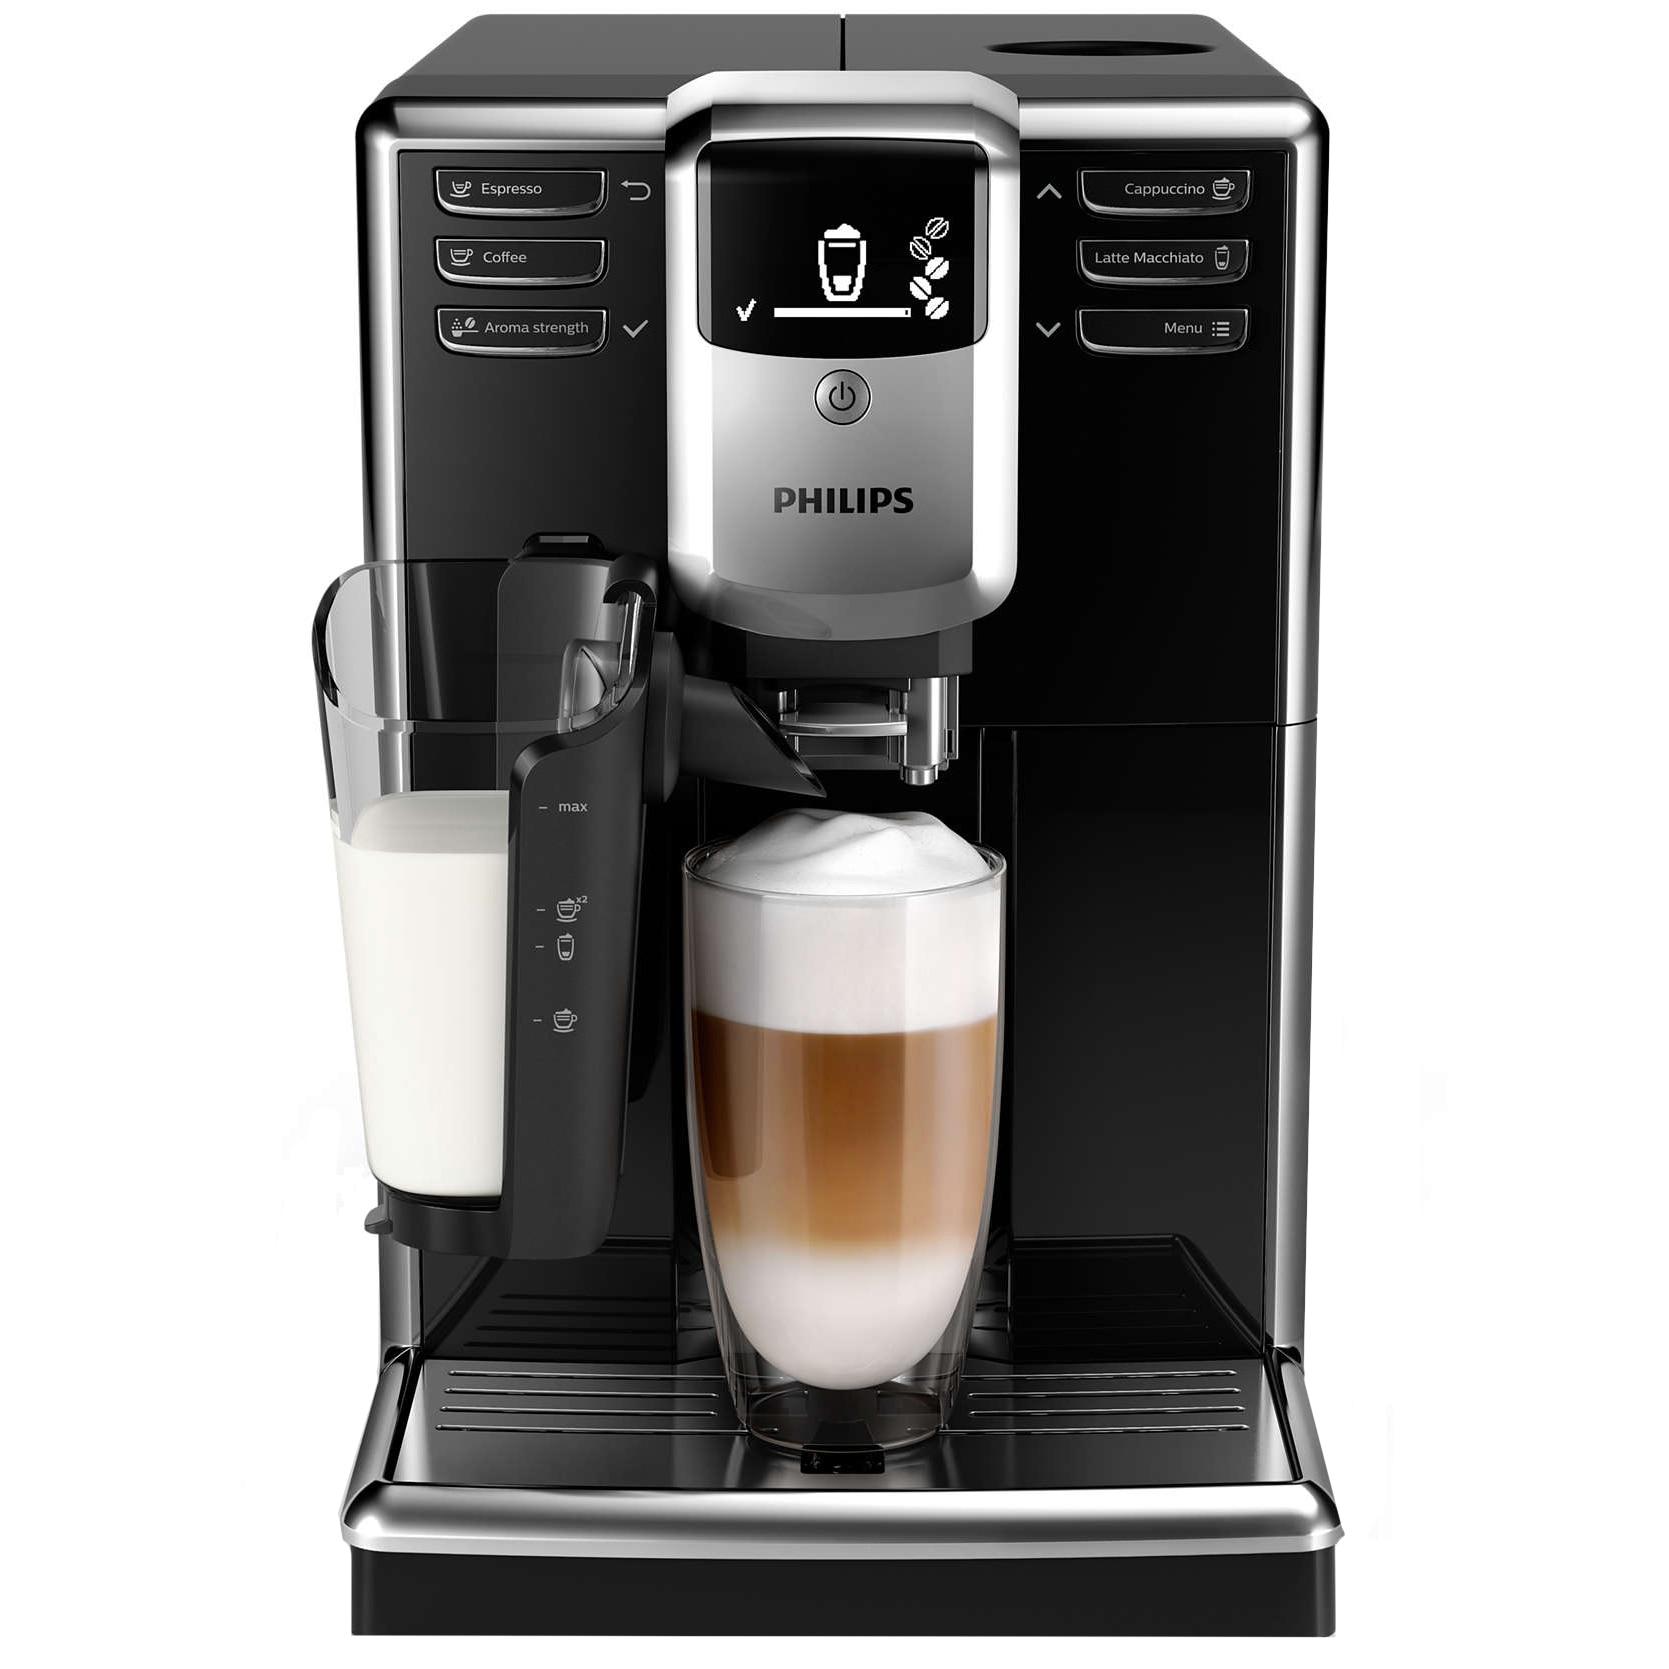 Fotografie Espressor automat Philips EP5330/10 Seria 5000, sistem de lapte LatteGo, 6 bauturi, 5 setari intensitate, 5 trepte macinare, rasnita ceramica, Negru